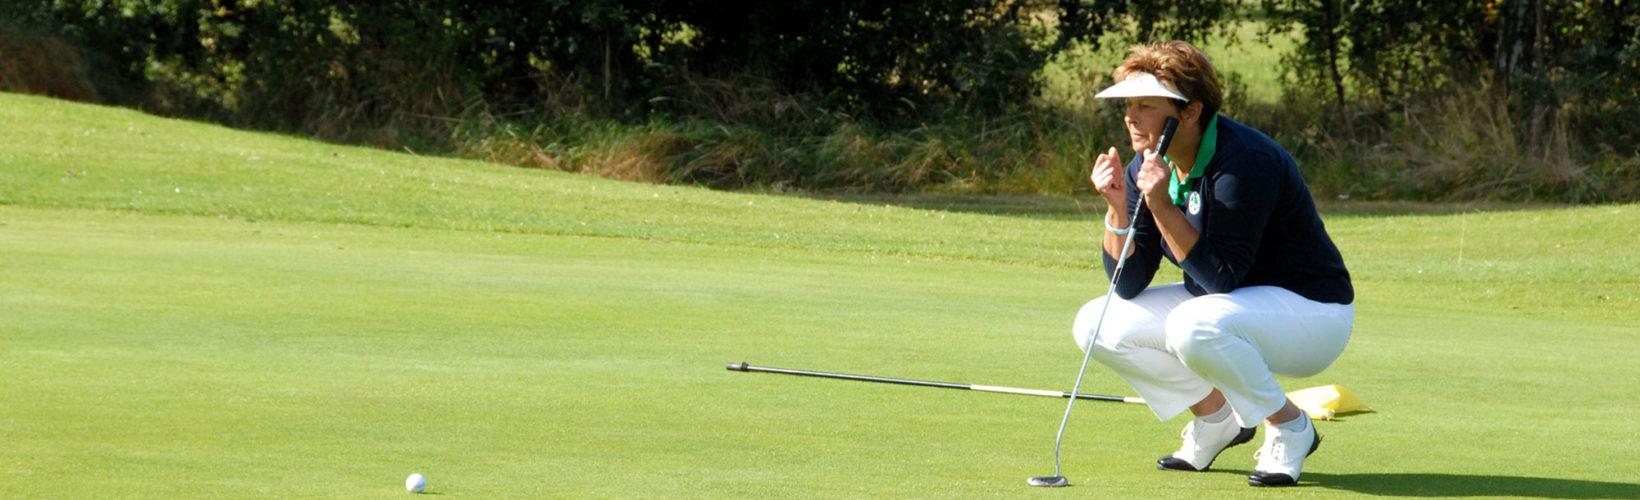 Play golf in Karlstad